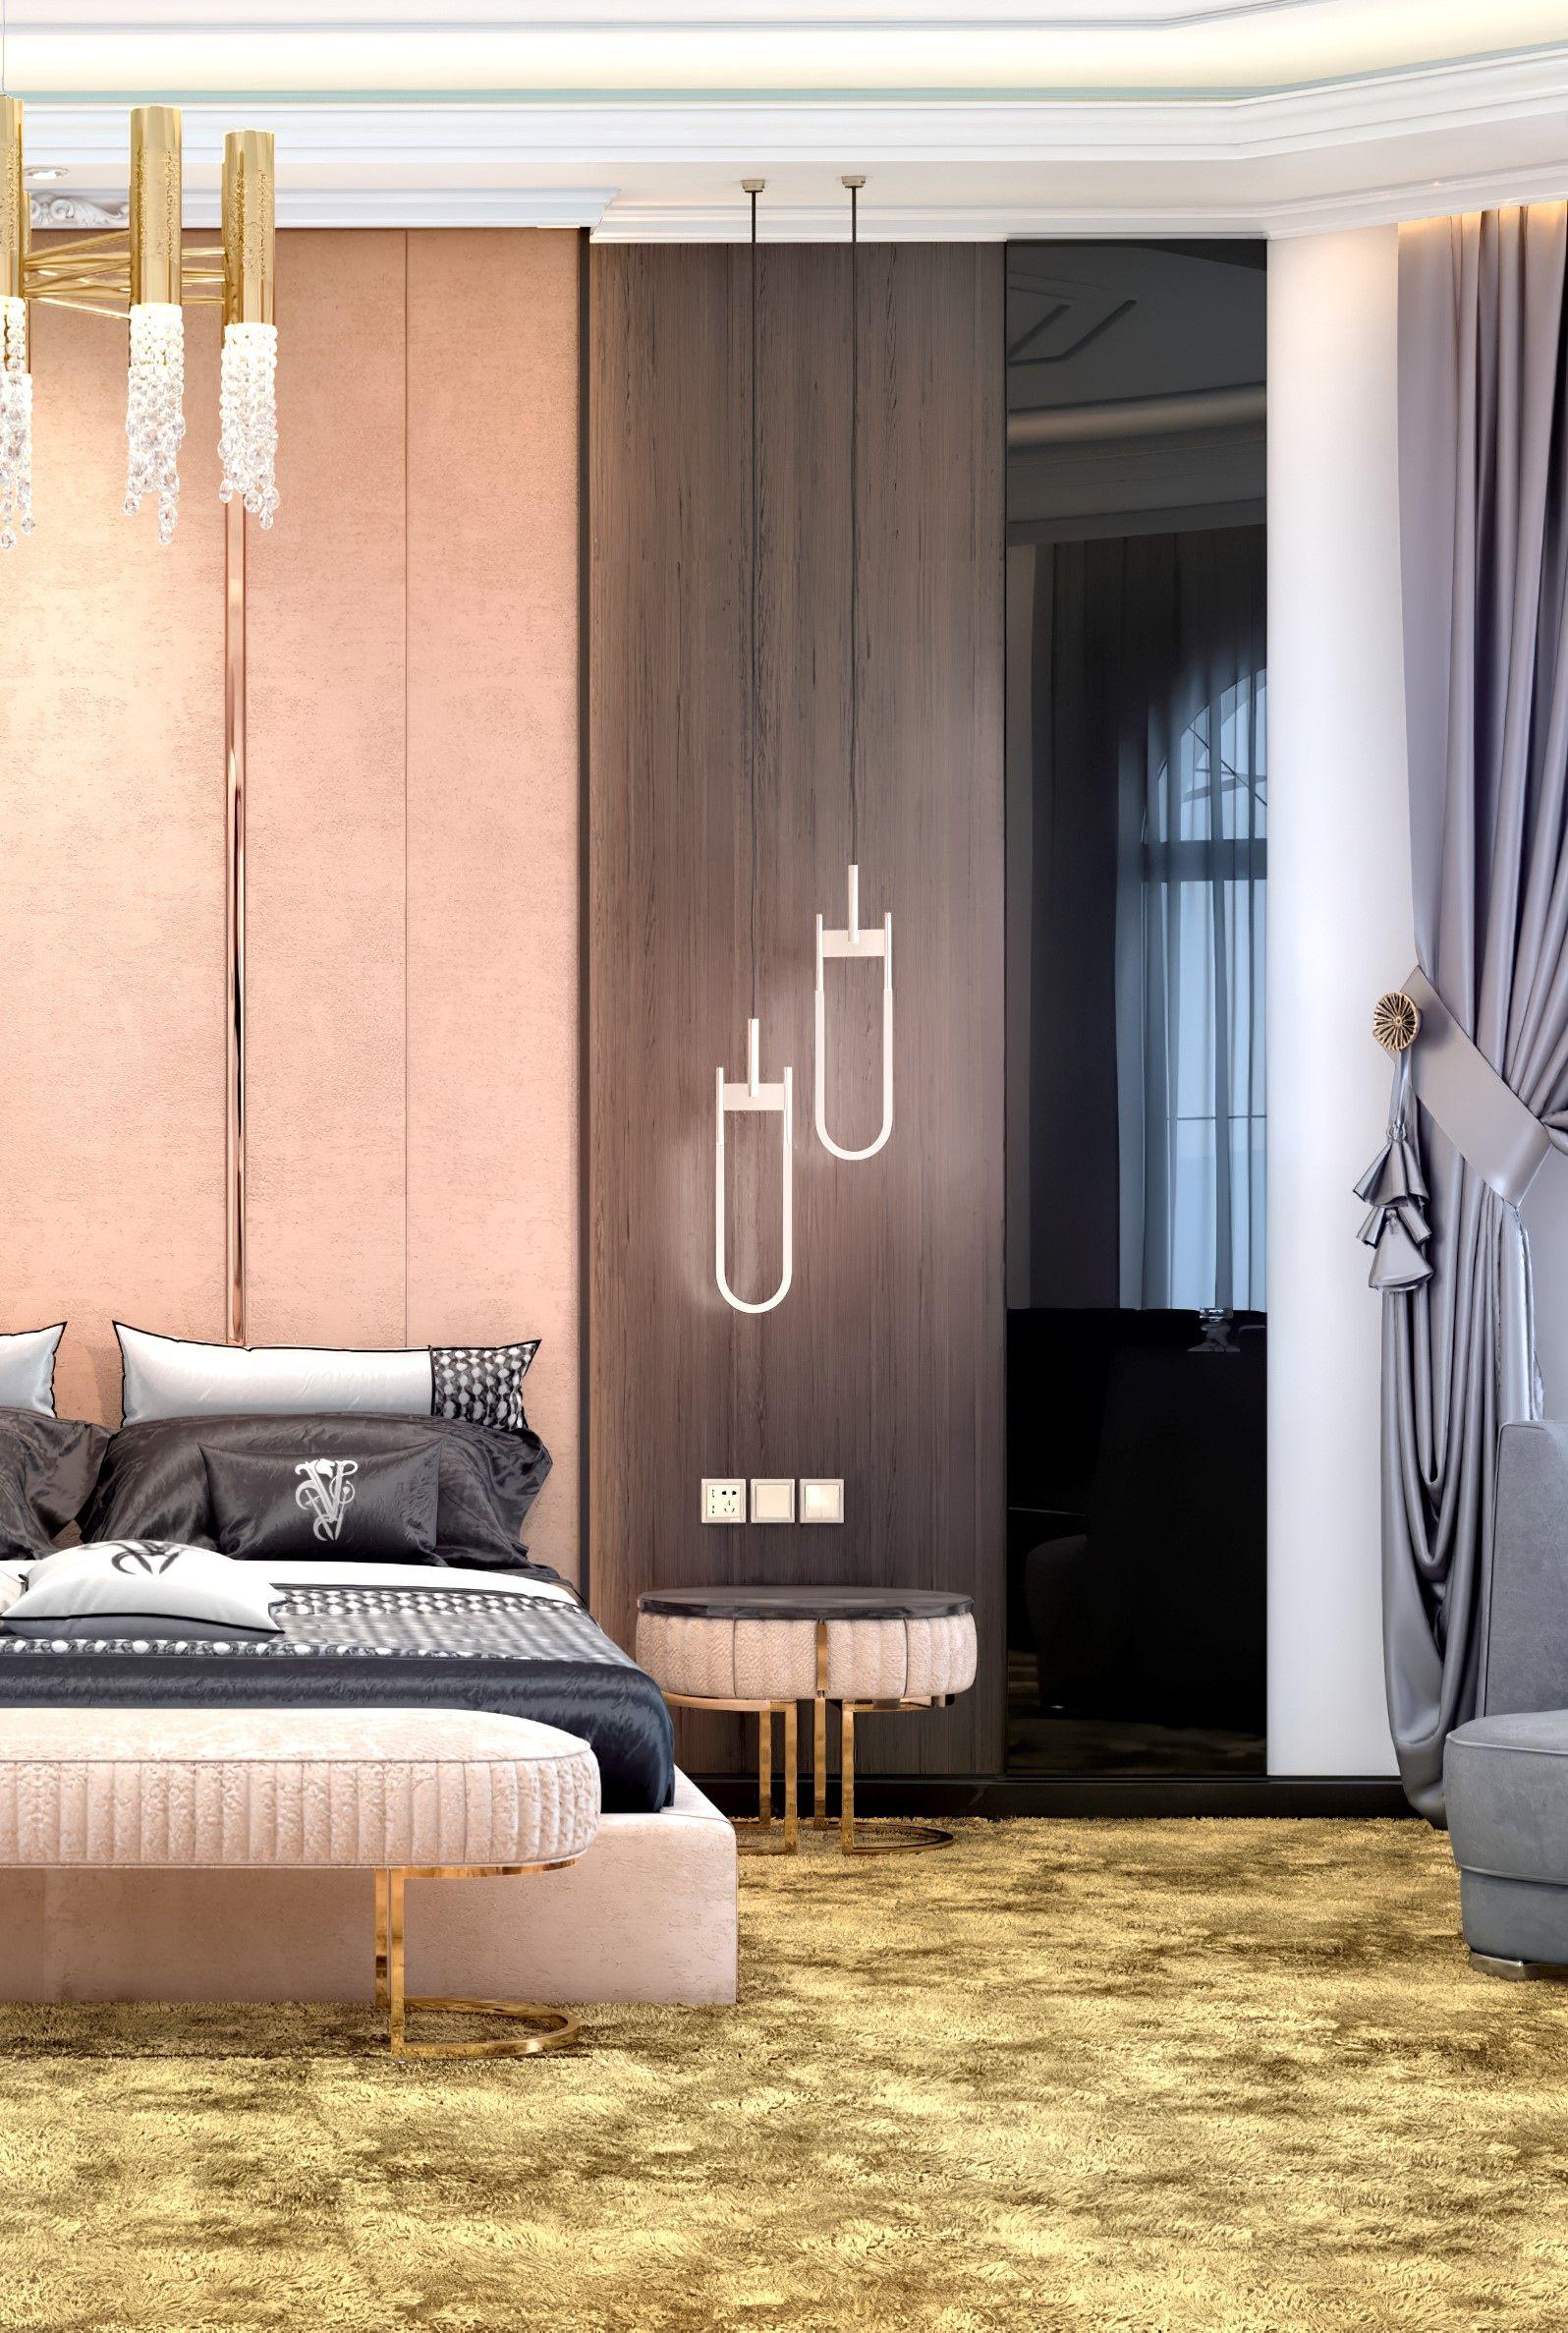 تصميم غرف النوم 2020 Interior Design Design Home Decor